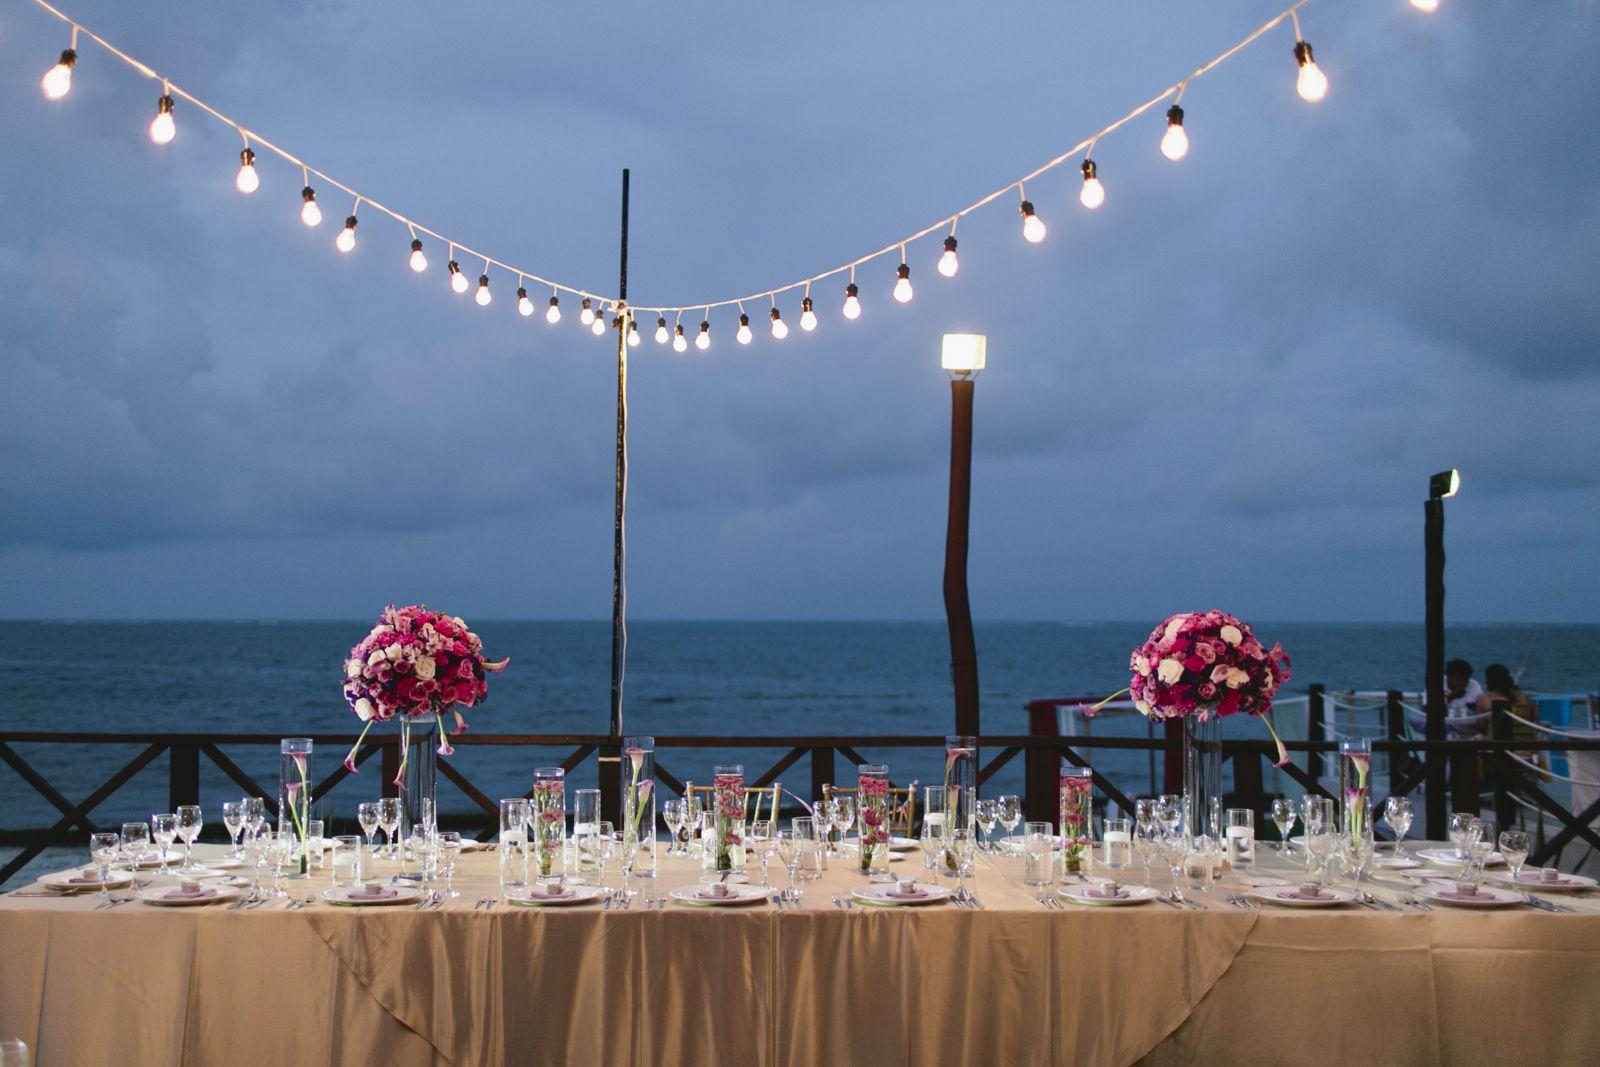 Reception - Bridal Party Table